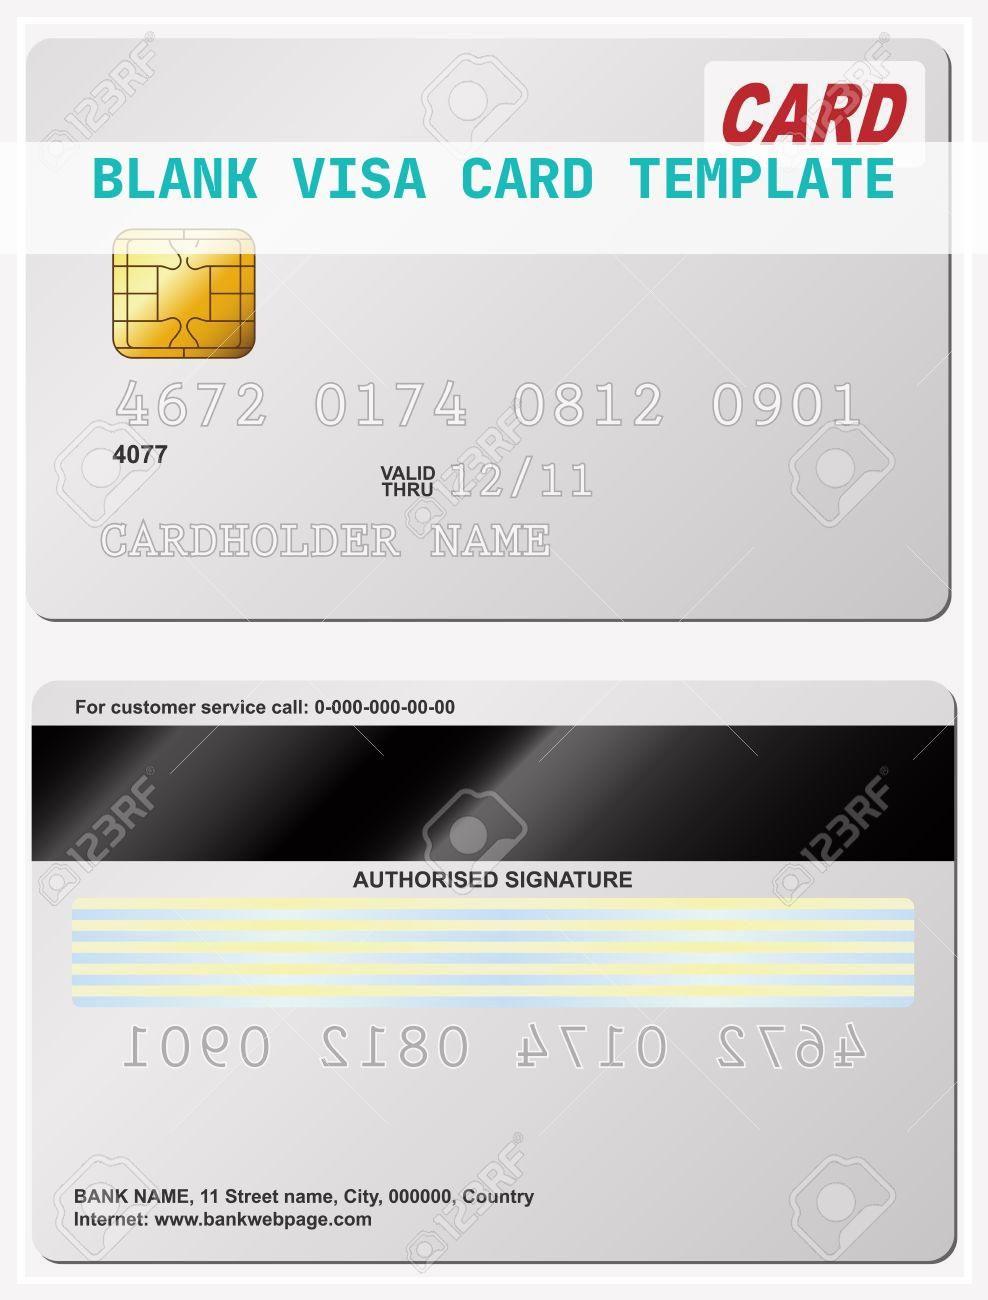 15 Topmost Blank Visa Card Template Visa Card Card Template Trading Card Template